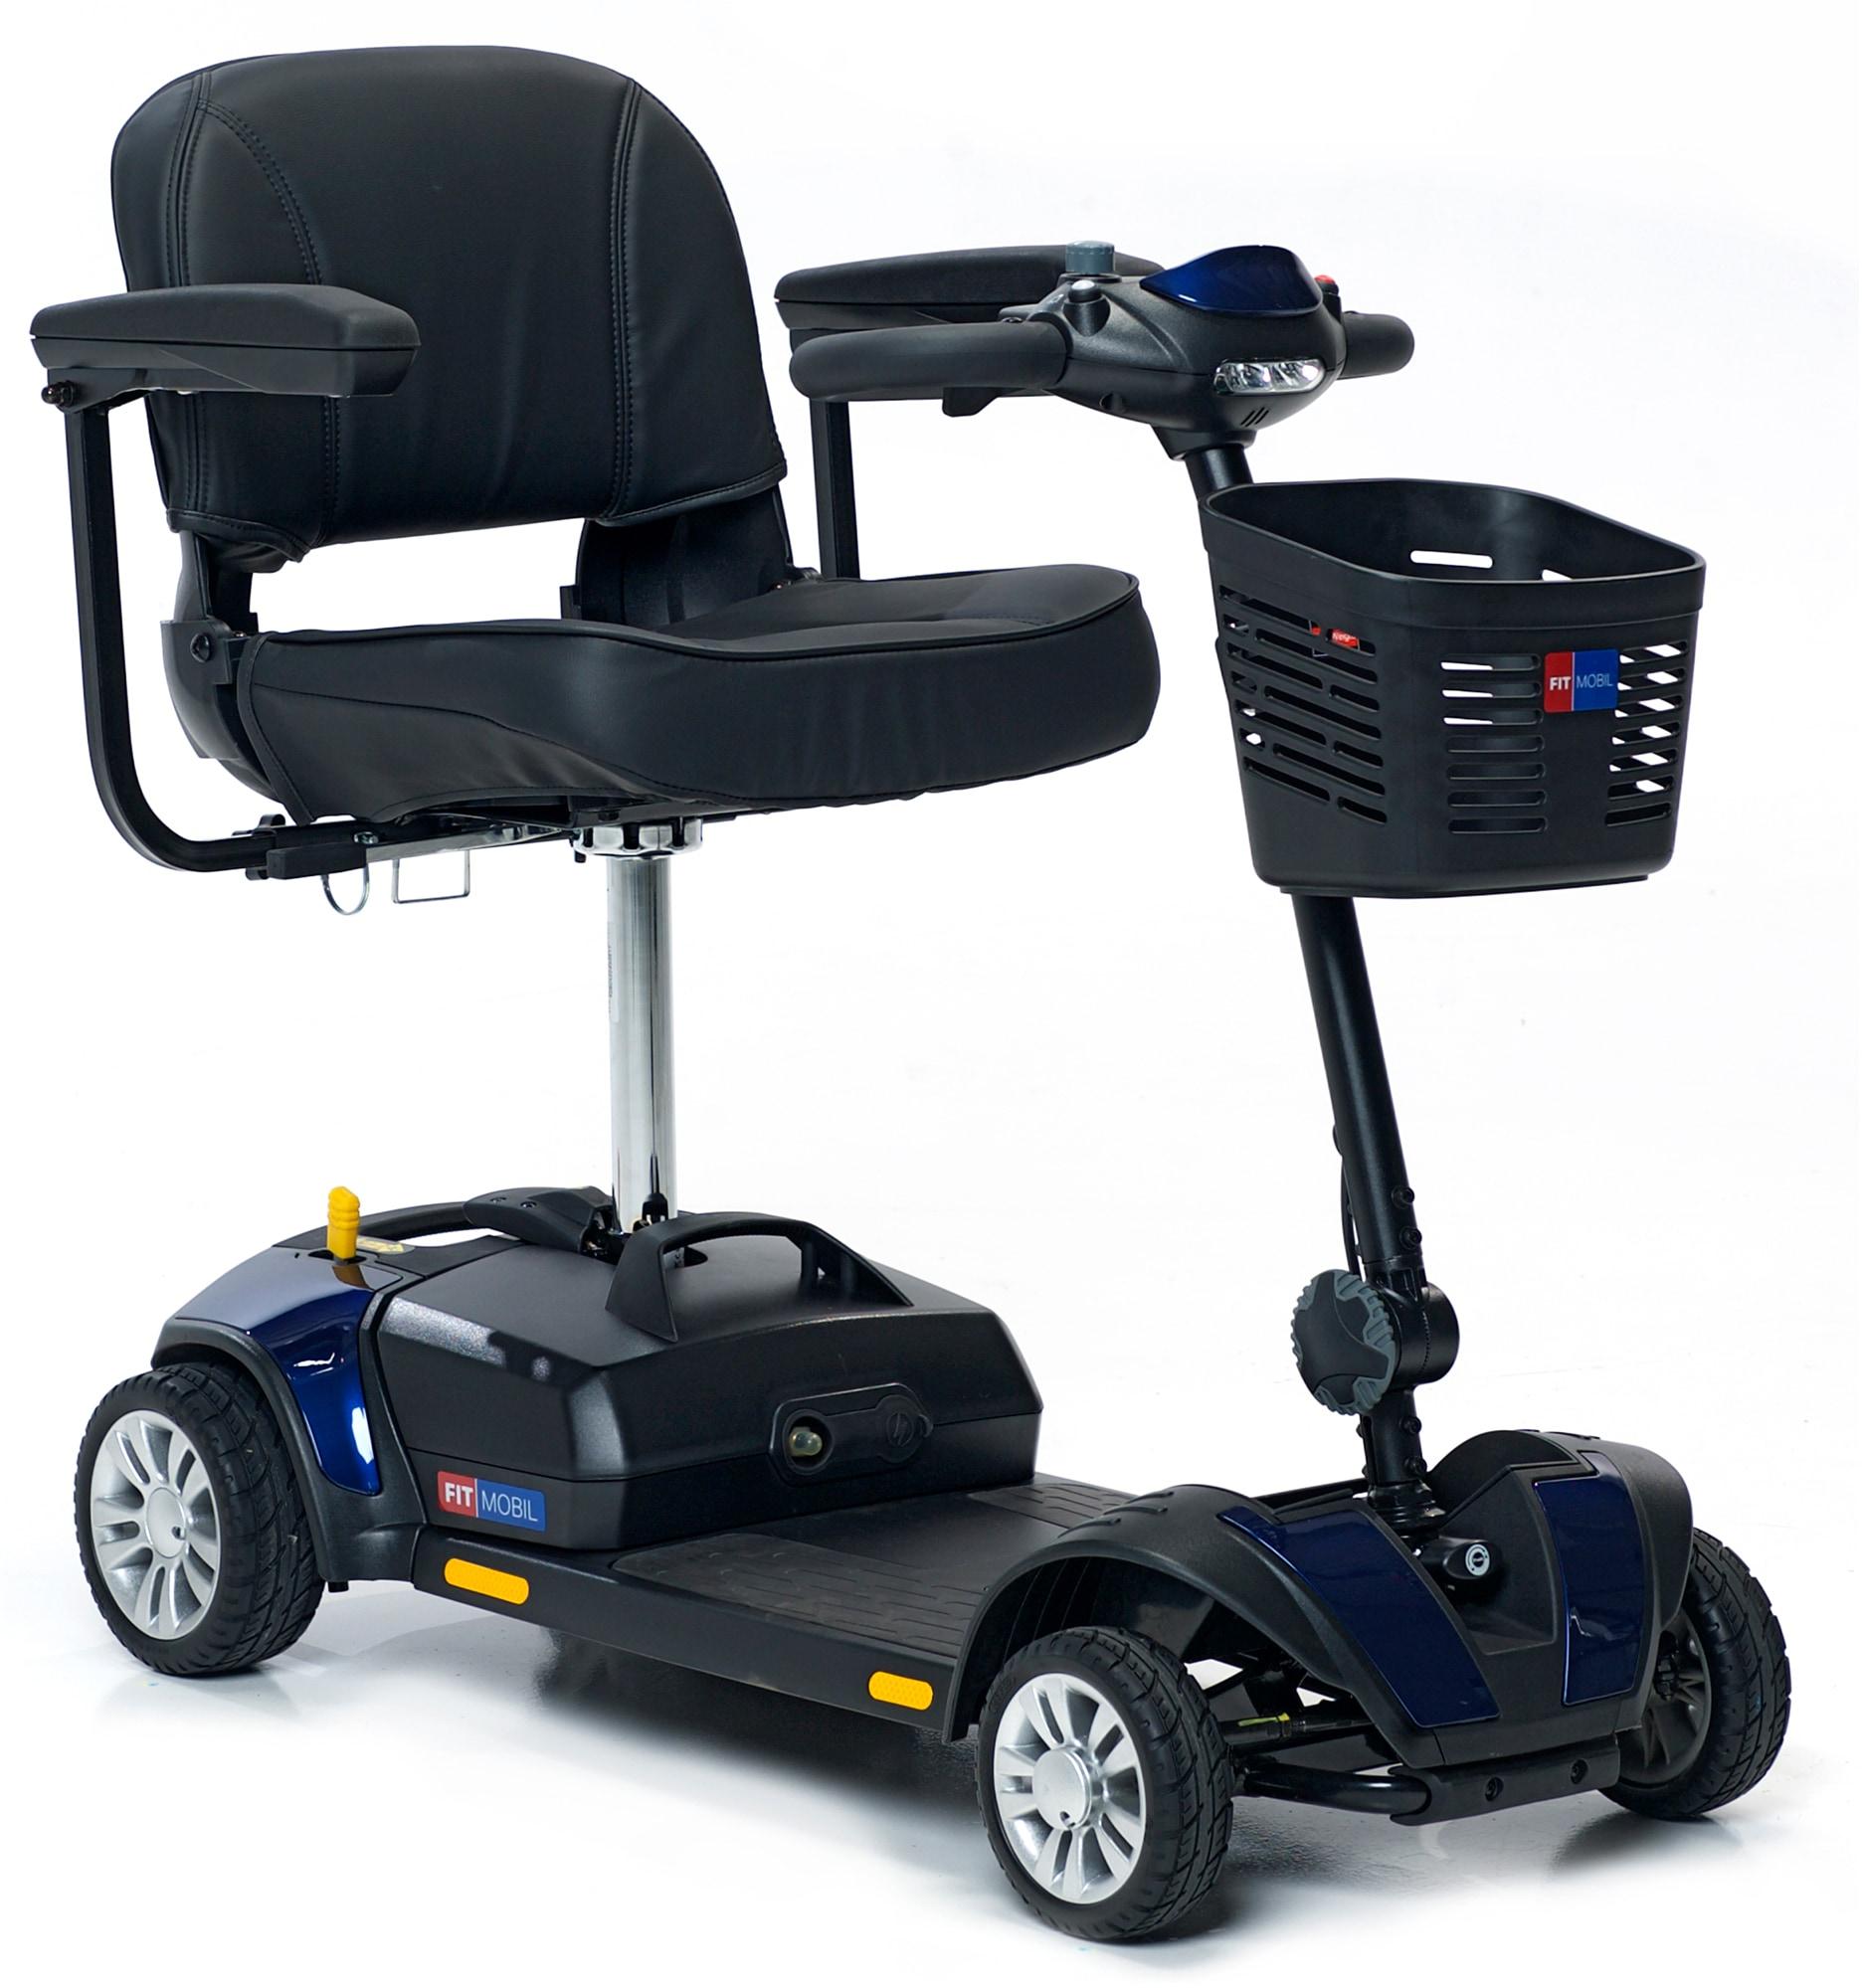 FITMOBIL Elektromobil, 6 km/h blau Elektromobile Motorroller Mofas Elektromobil